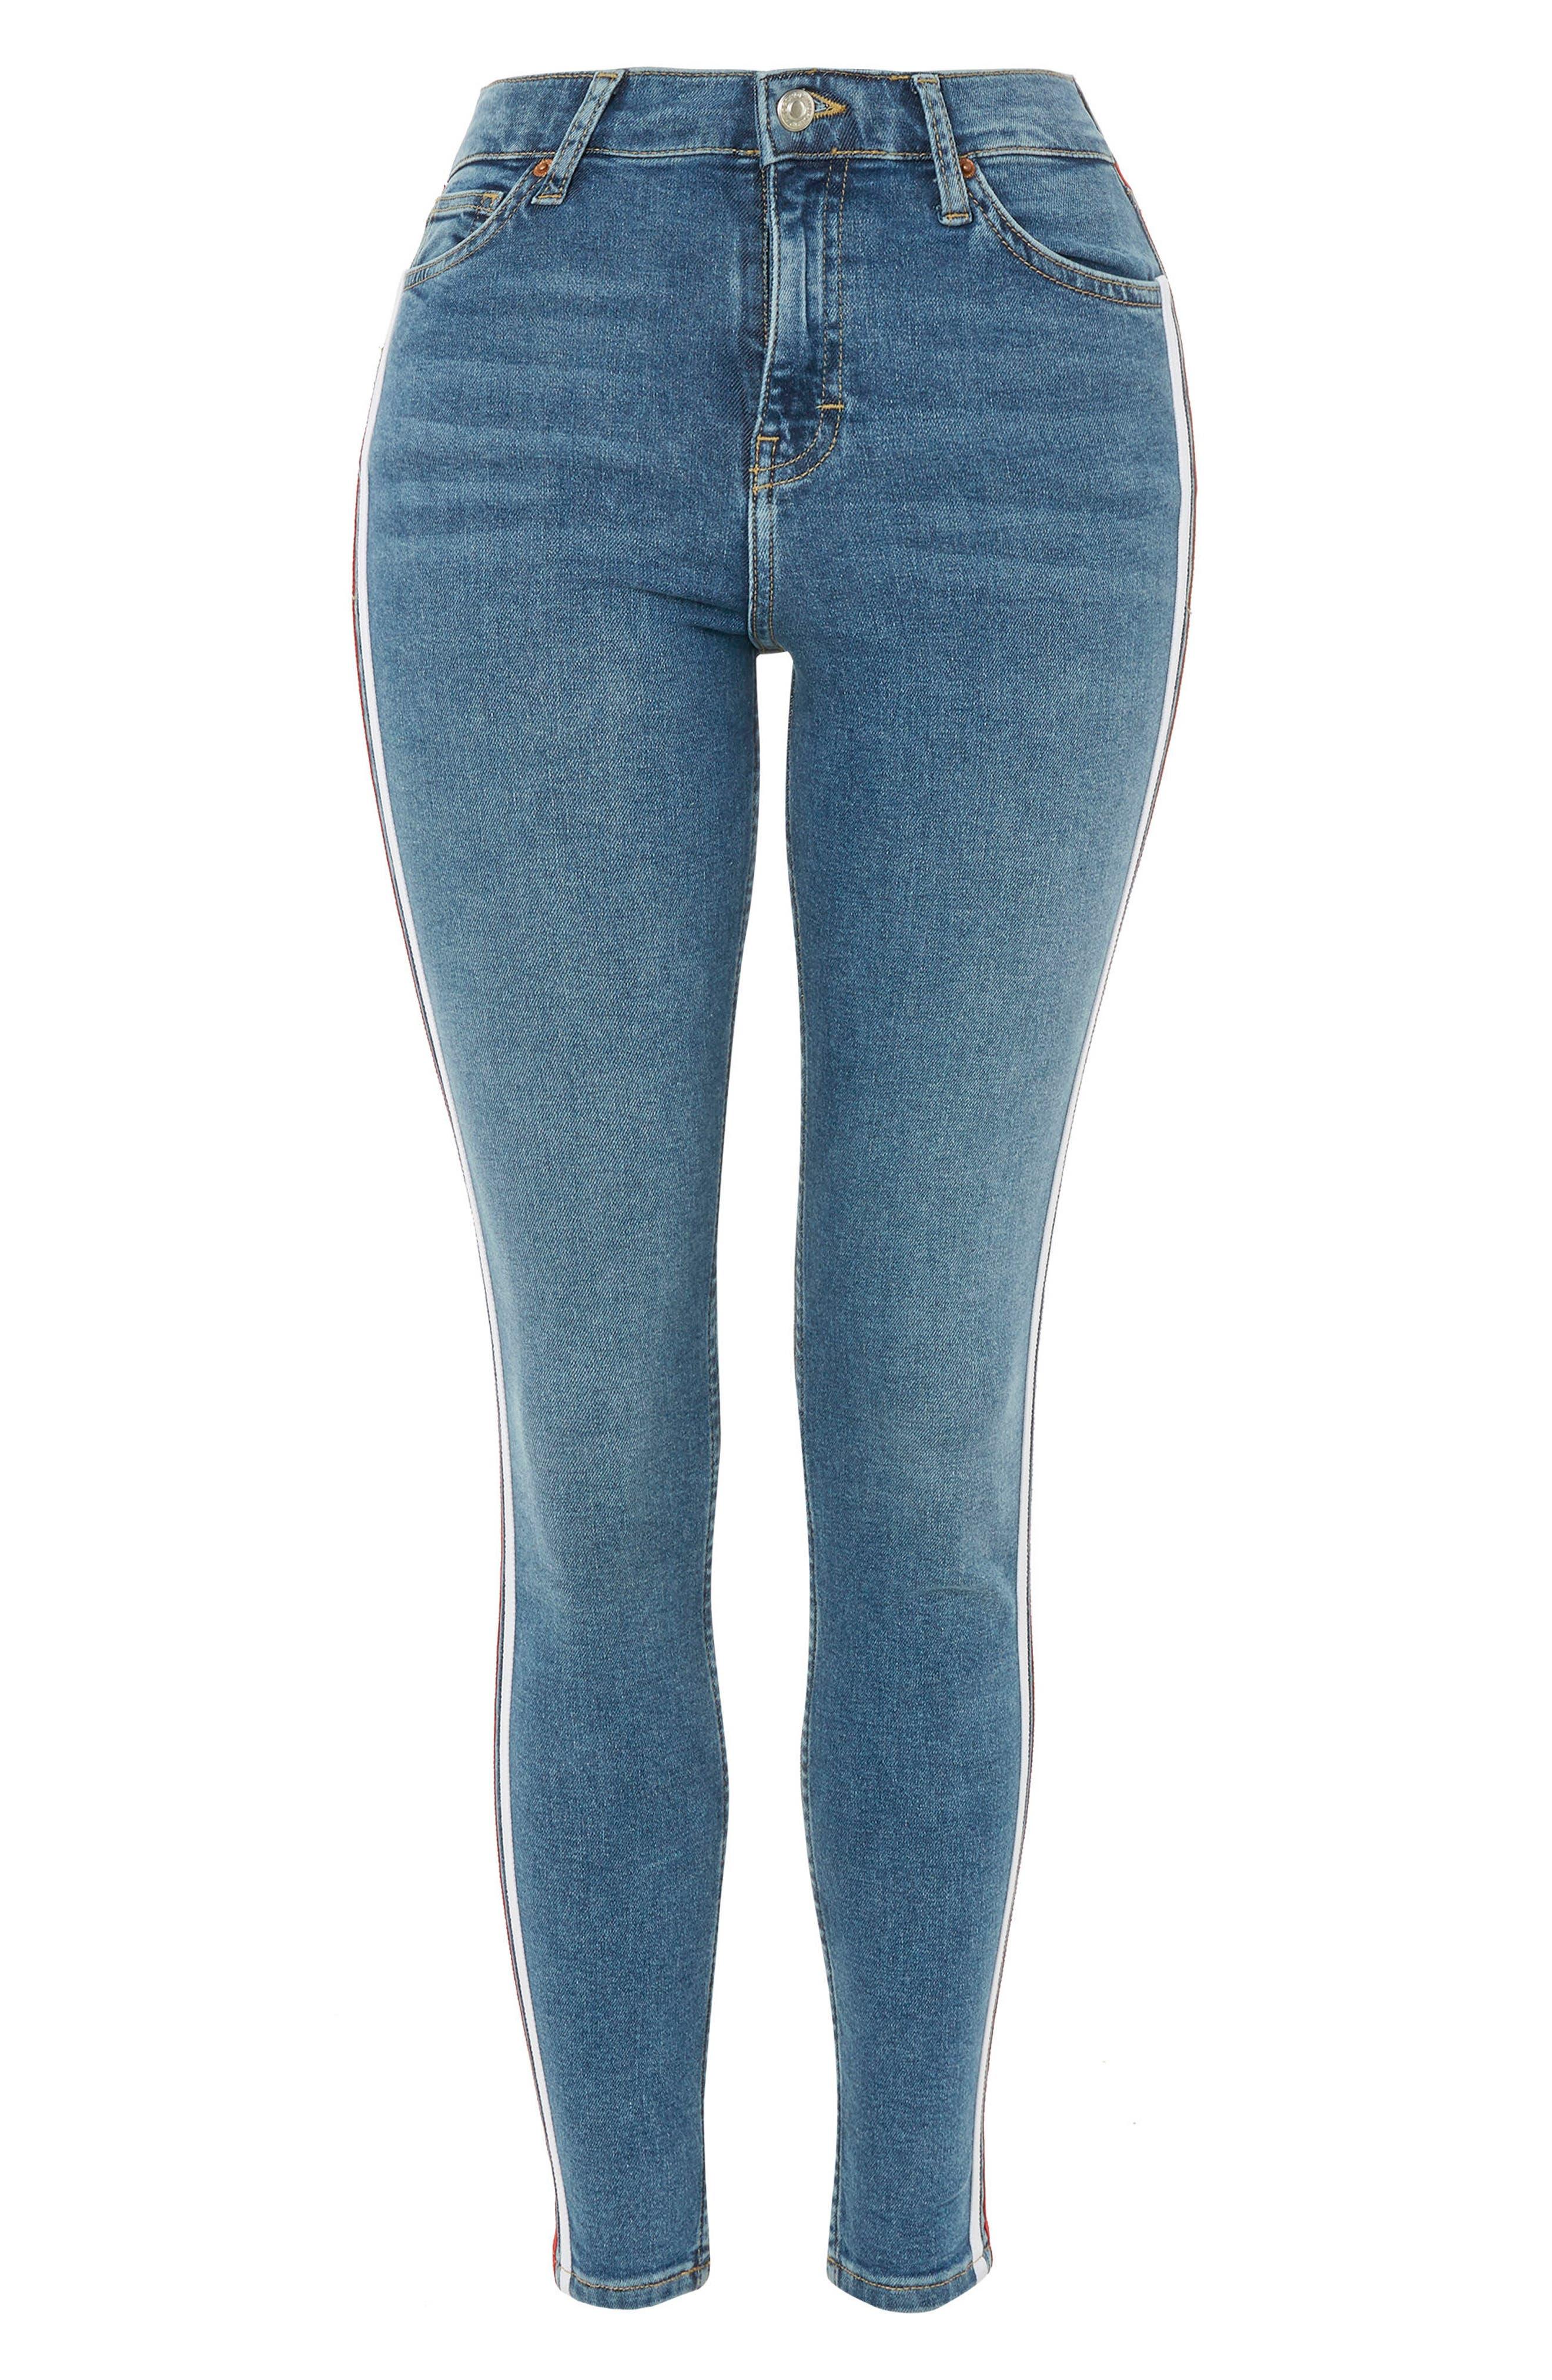 Jamie Side Stripe Jeans,                             Alternate thumbnail 4, color,                             Mid Denim Multi